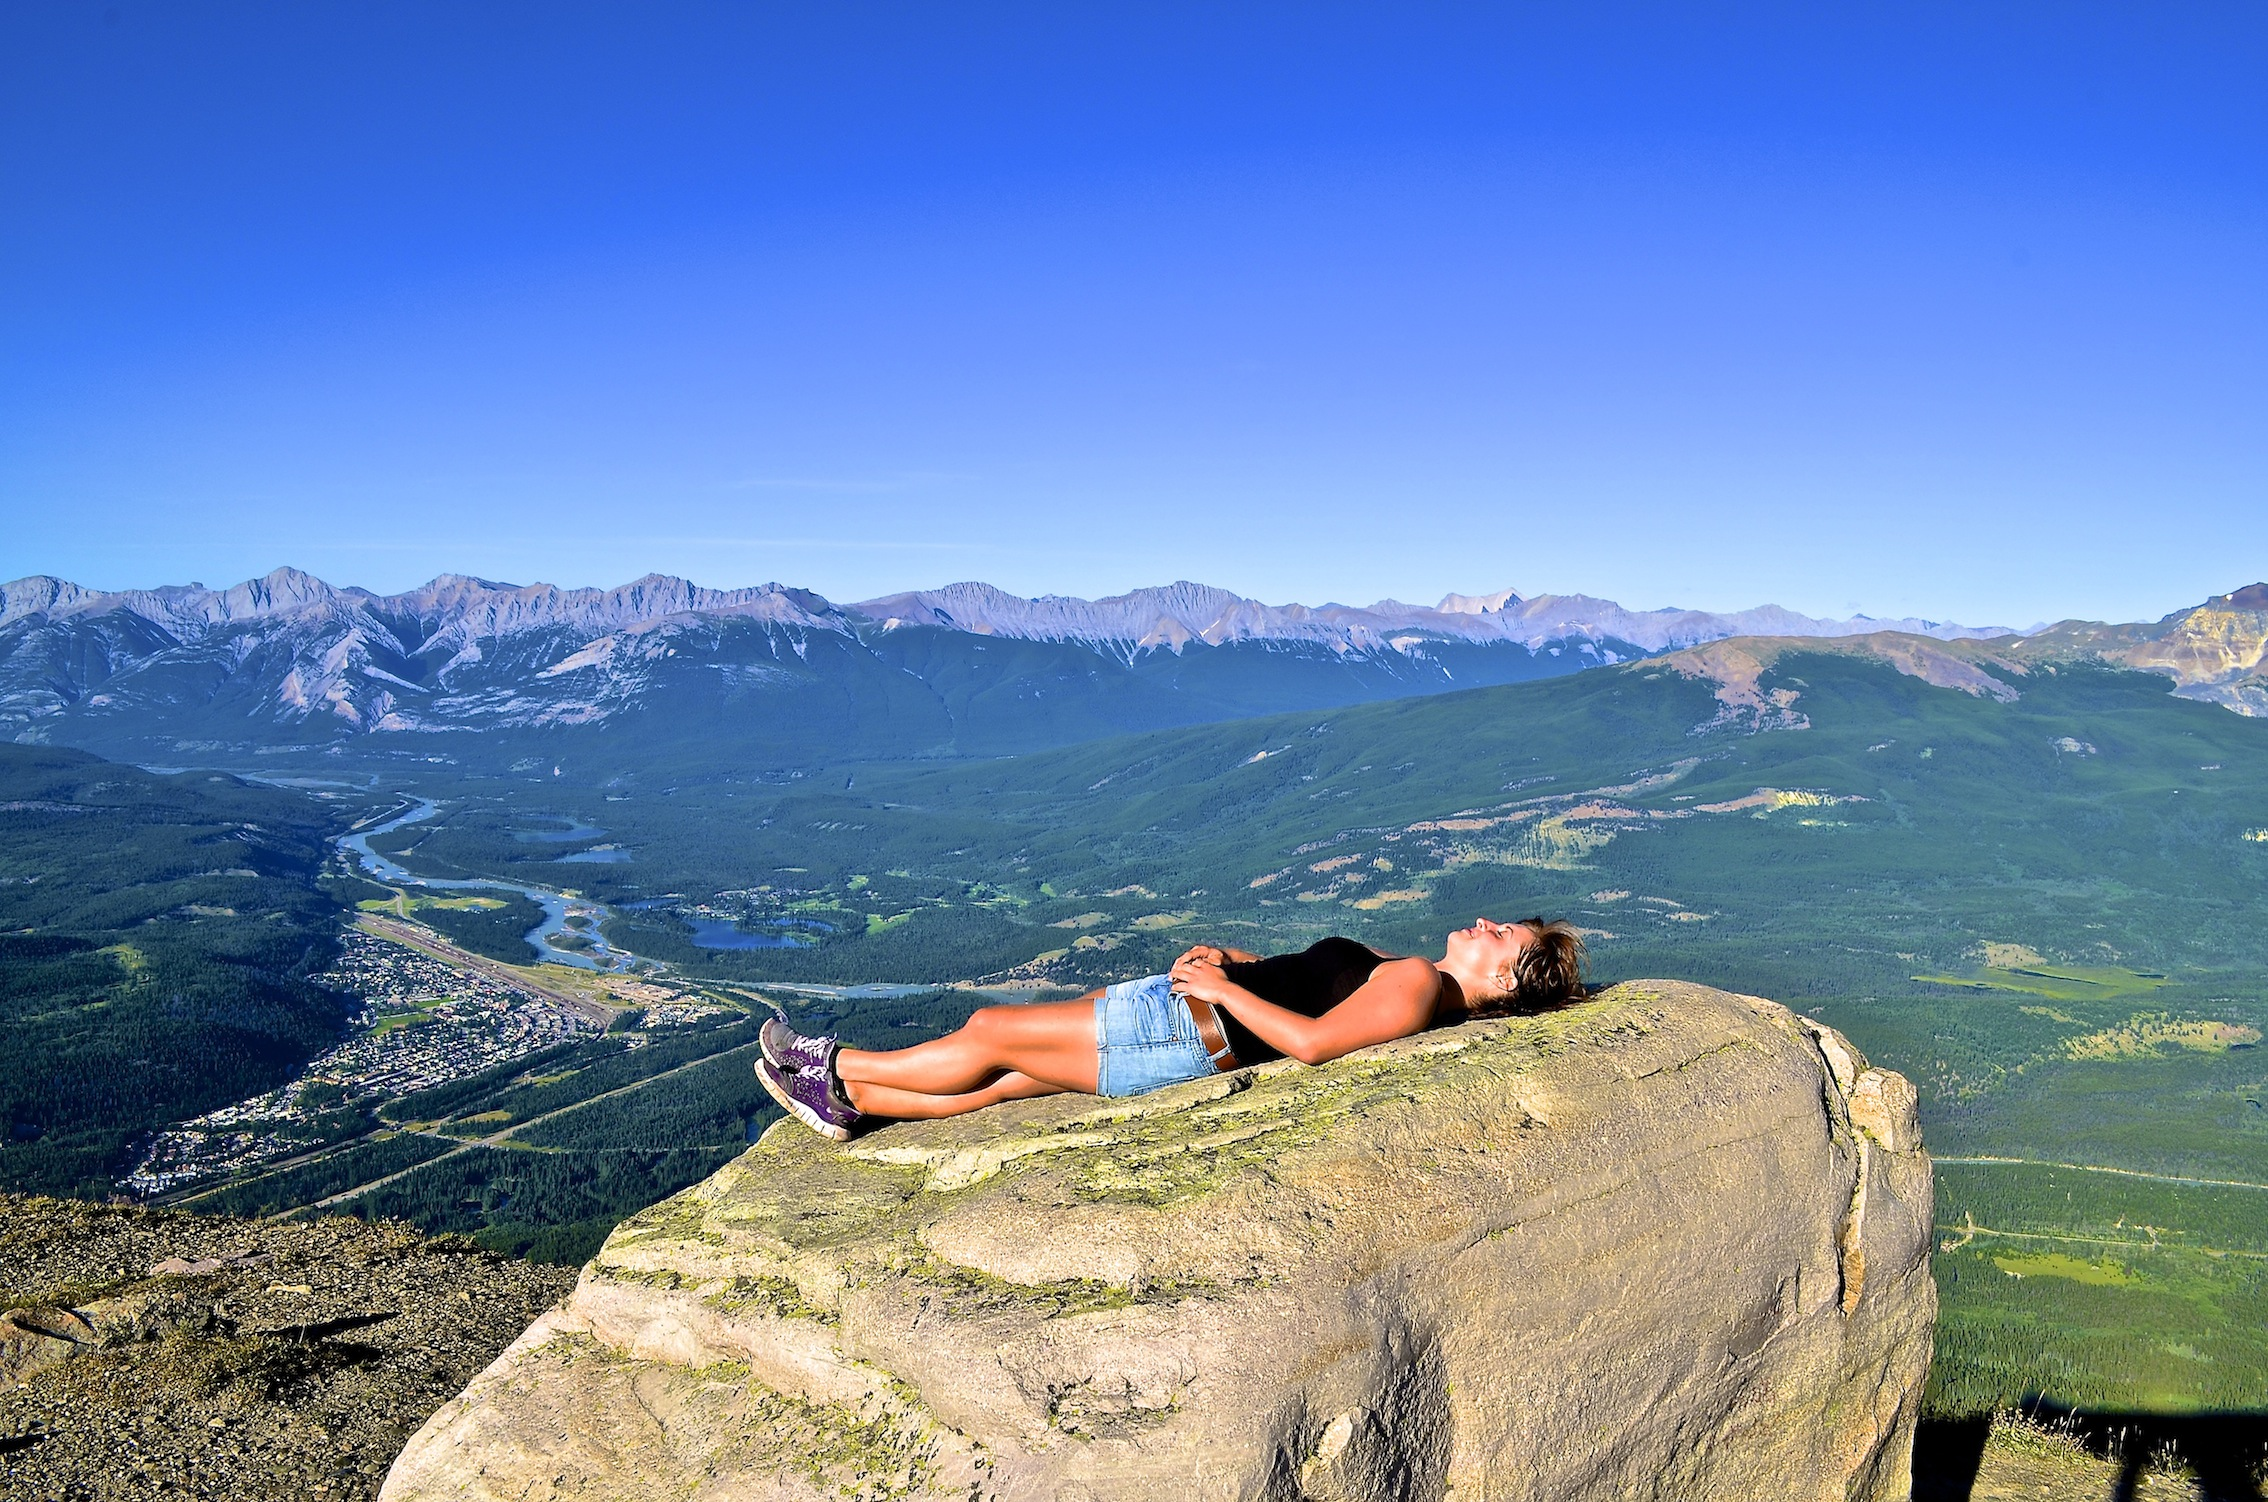 Jasper National Park Top 6 Things To Do Irina Chernetskaya